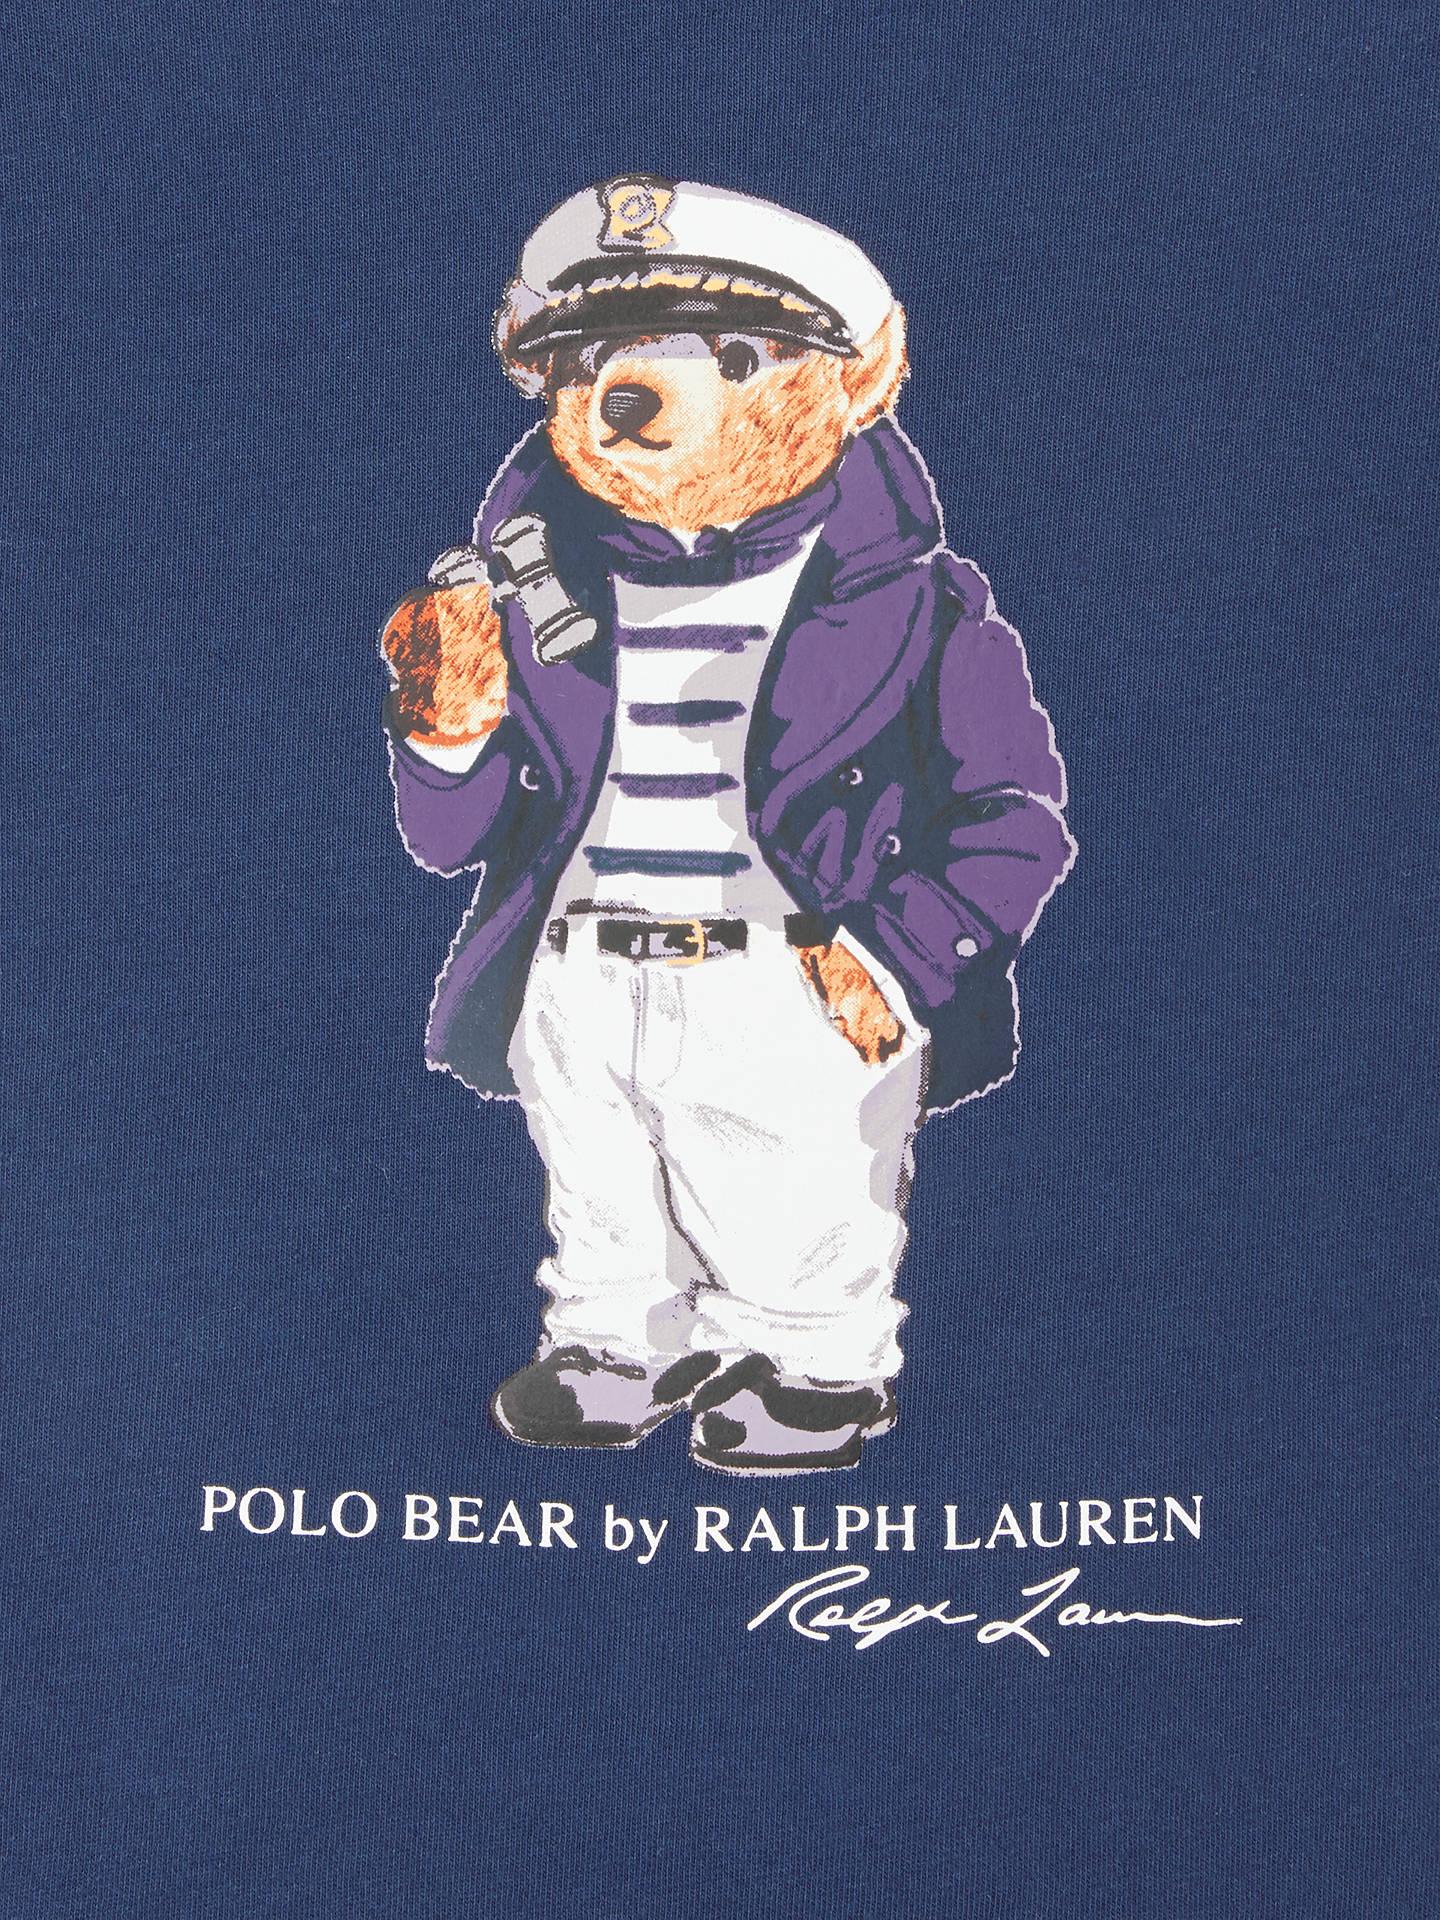 ralph lauren polo bear iphone 7 cases